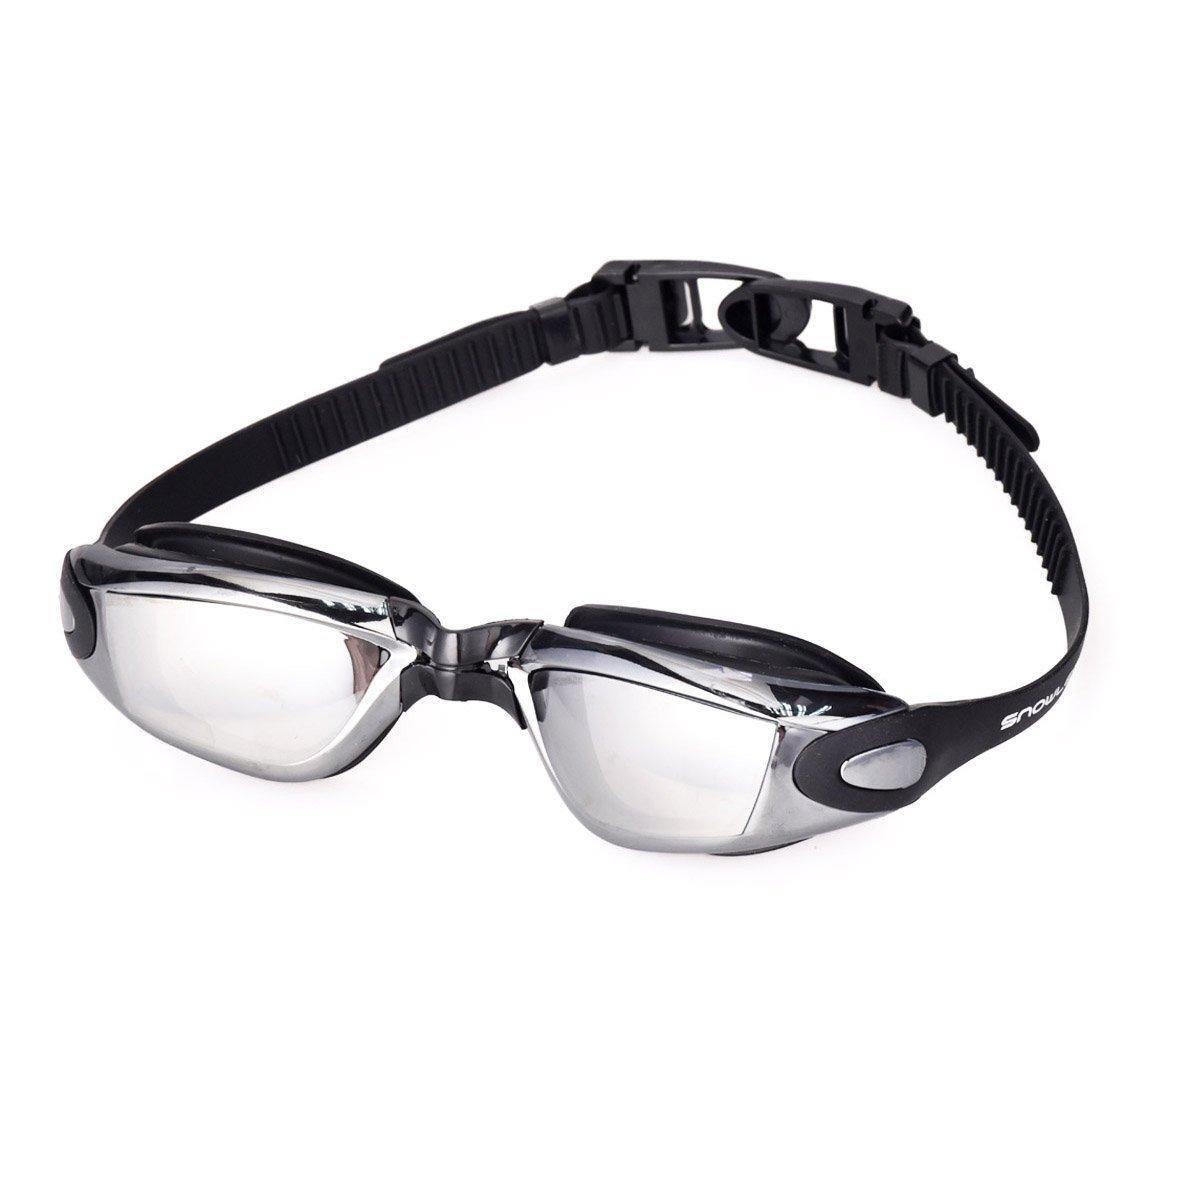 Sin & Mi Swim Goggles Professional Anti Fog no leaking UV保護Wide View Swim Goggles for大人ユースキッズレディースメンズ   B07D28K552